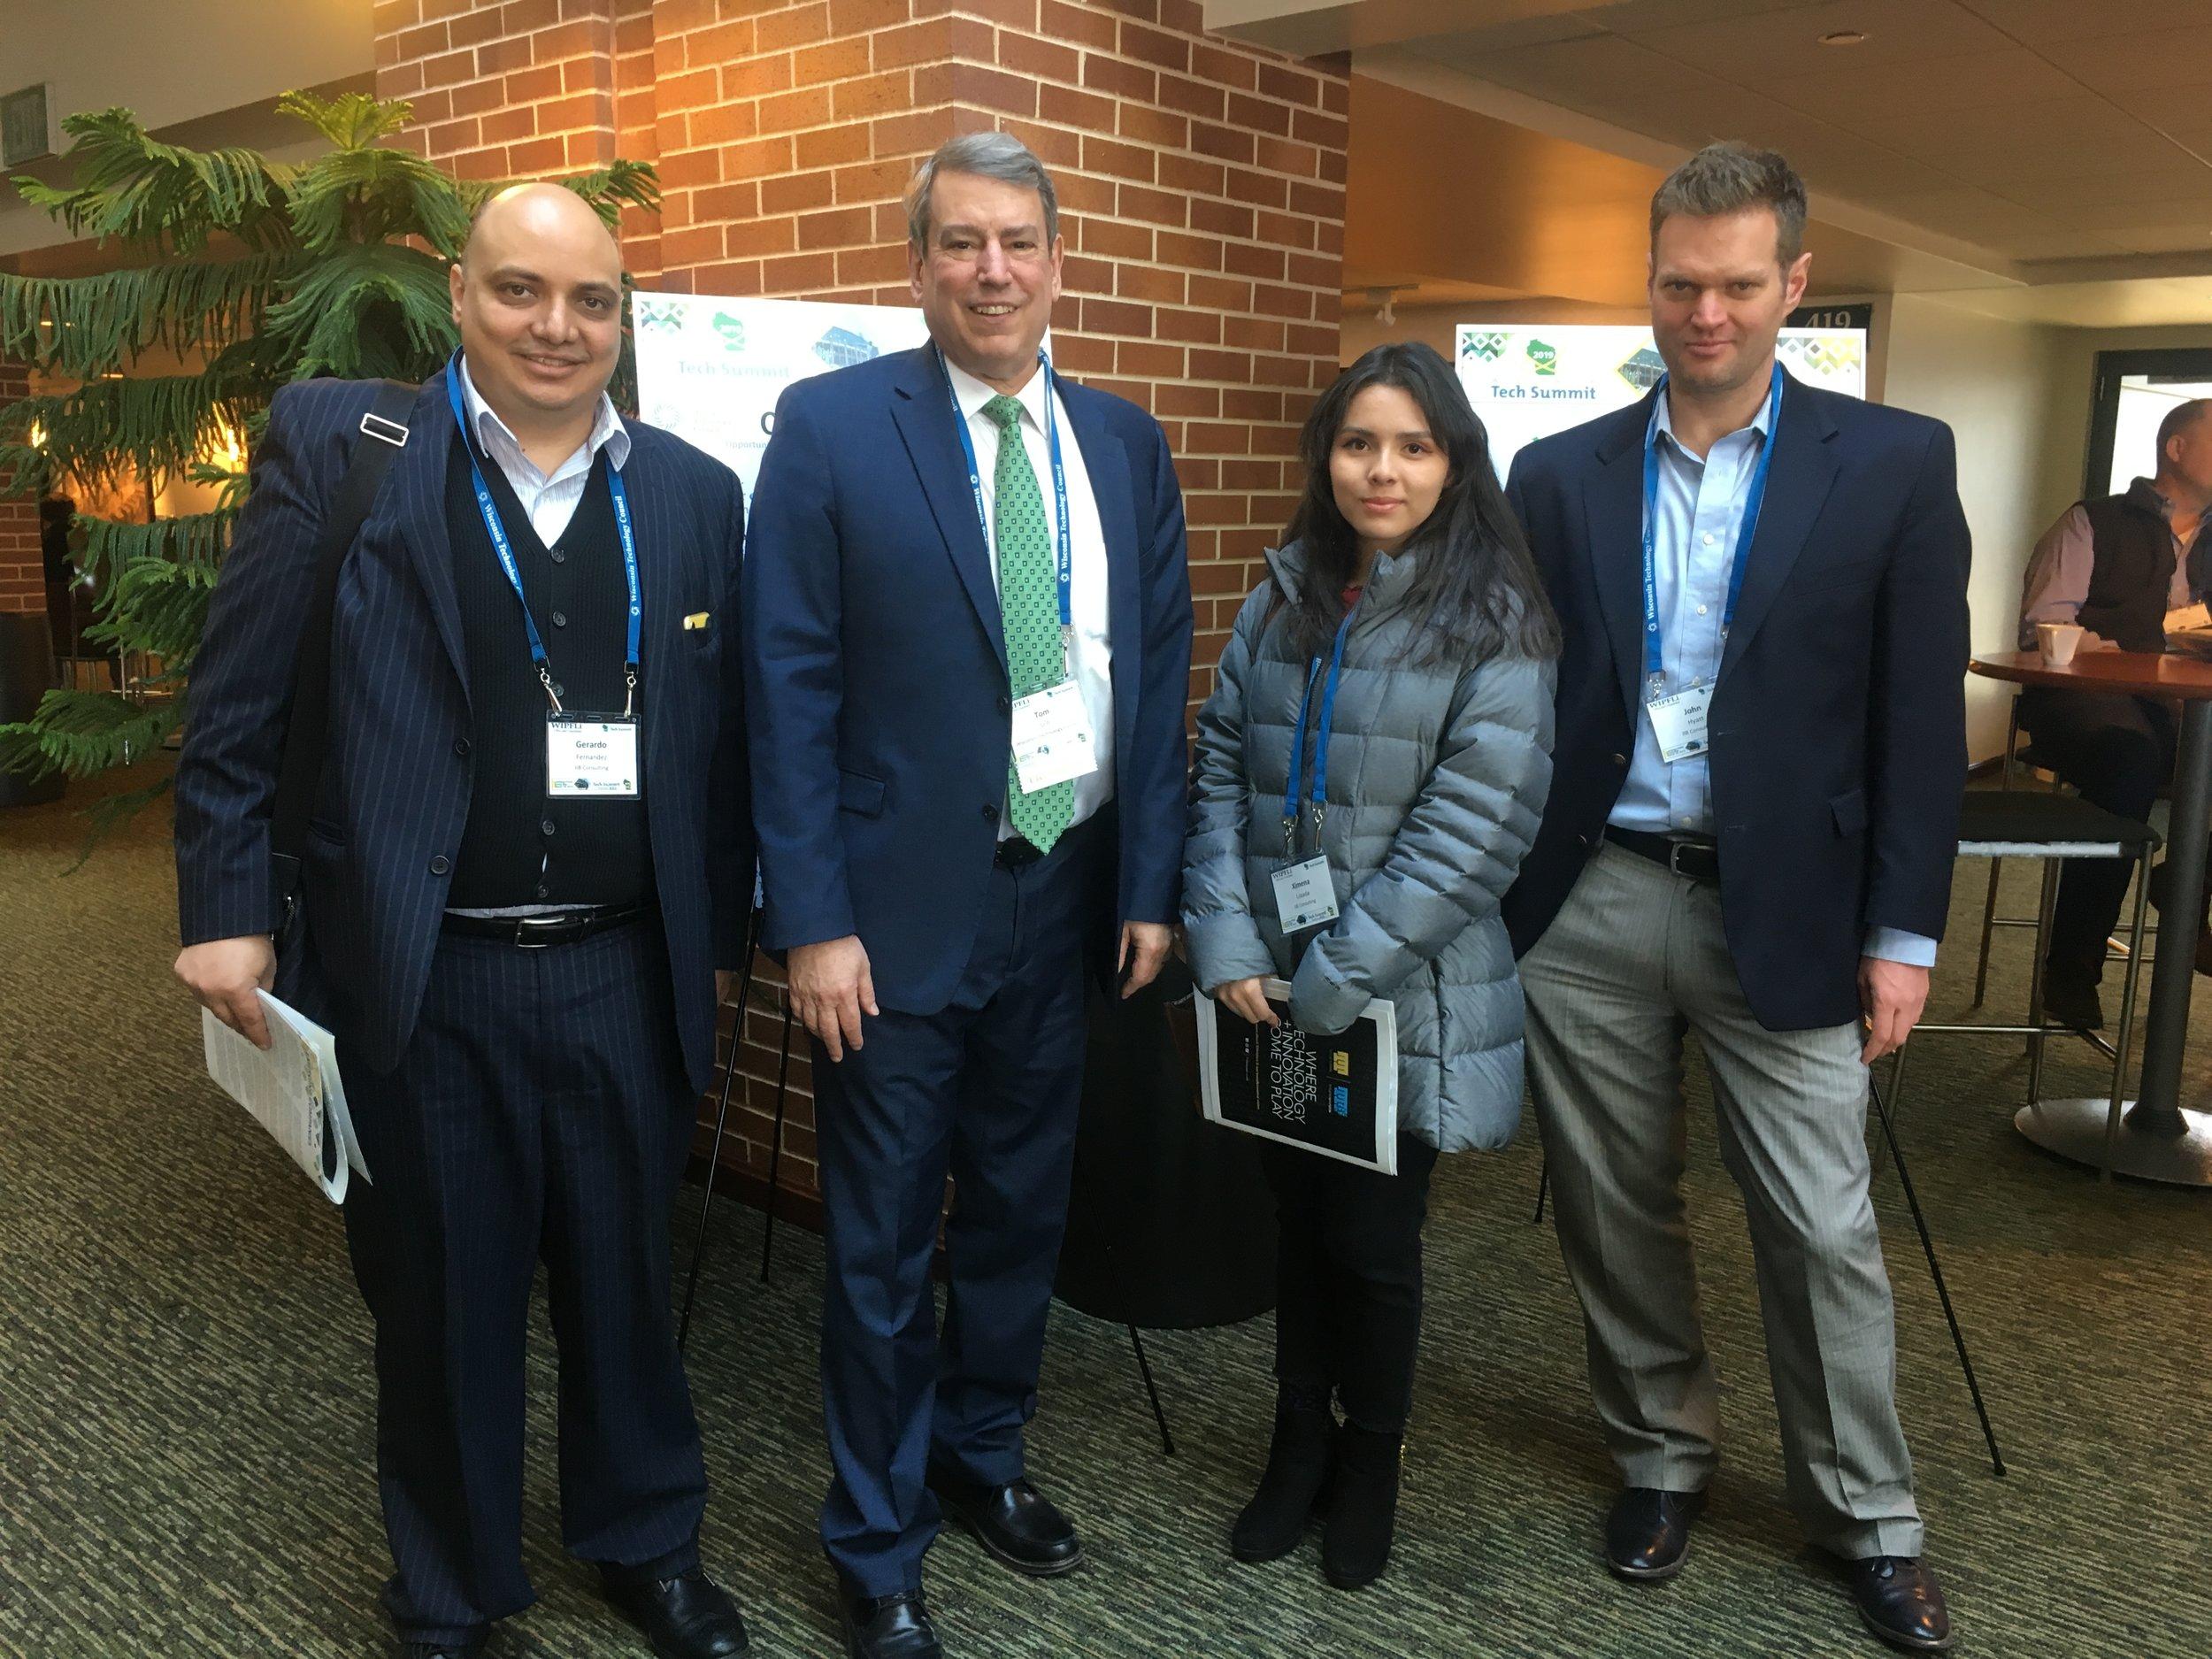 IIB Consulting at the WI Technology Summit. Pictured from left to right: Gerardo Fernandez, Tom Still, Ximena Lozada, & John Hyatt.